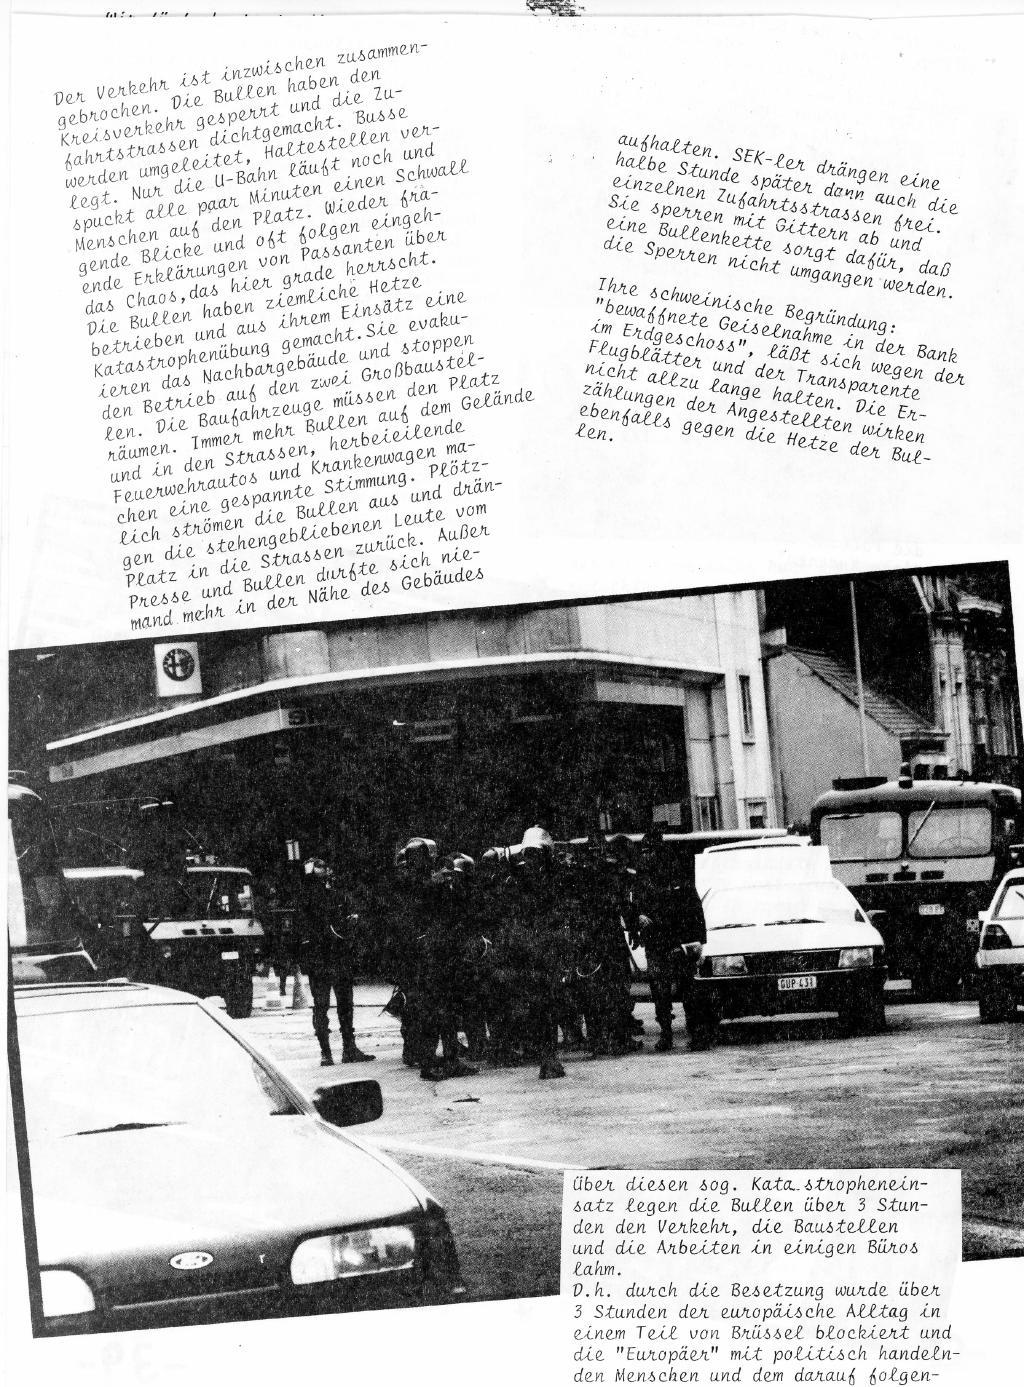 Belgien_Doku_Besetzung_EG_Kommission_1989_042